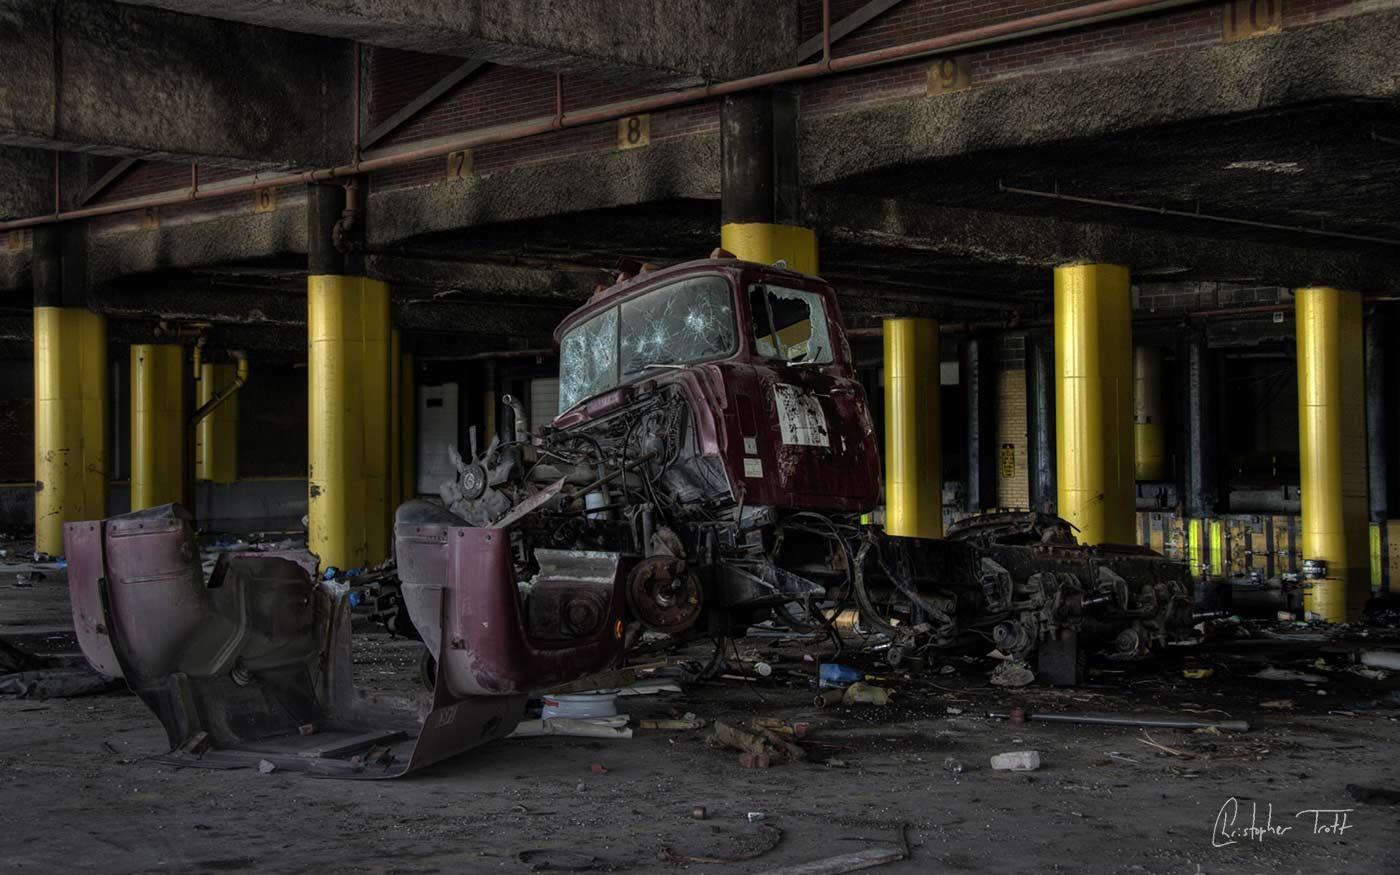 Ghetto Mechanics